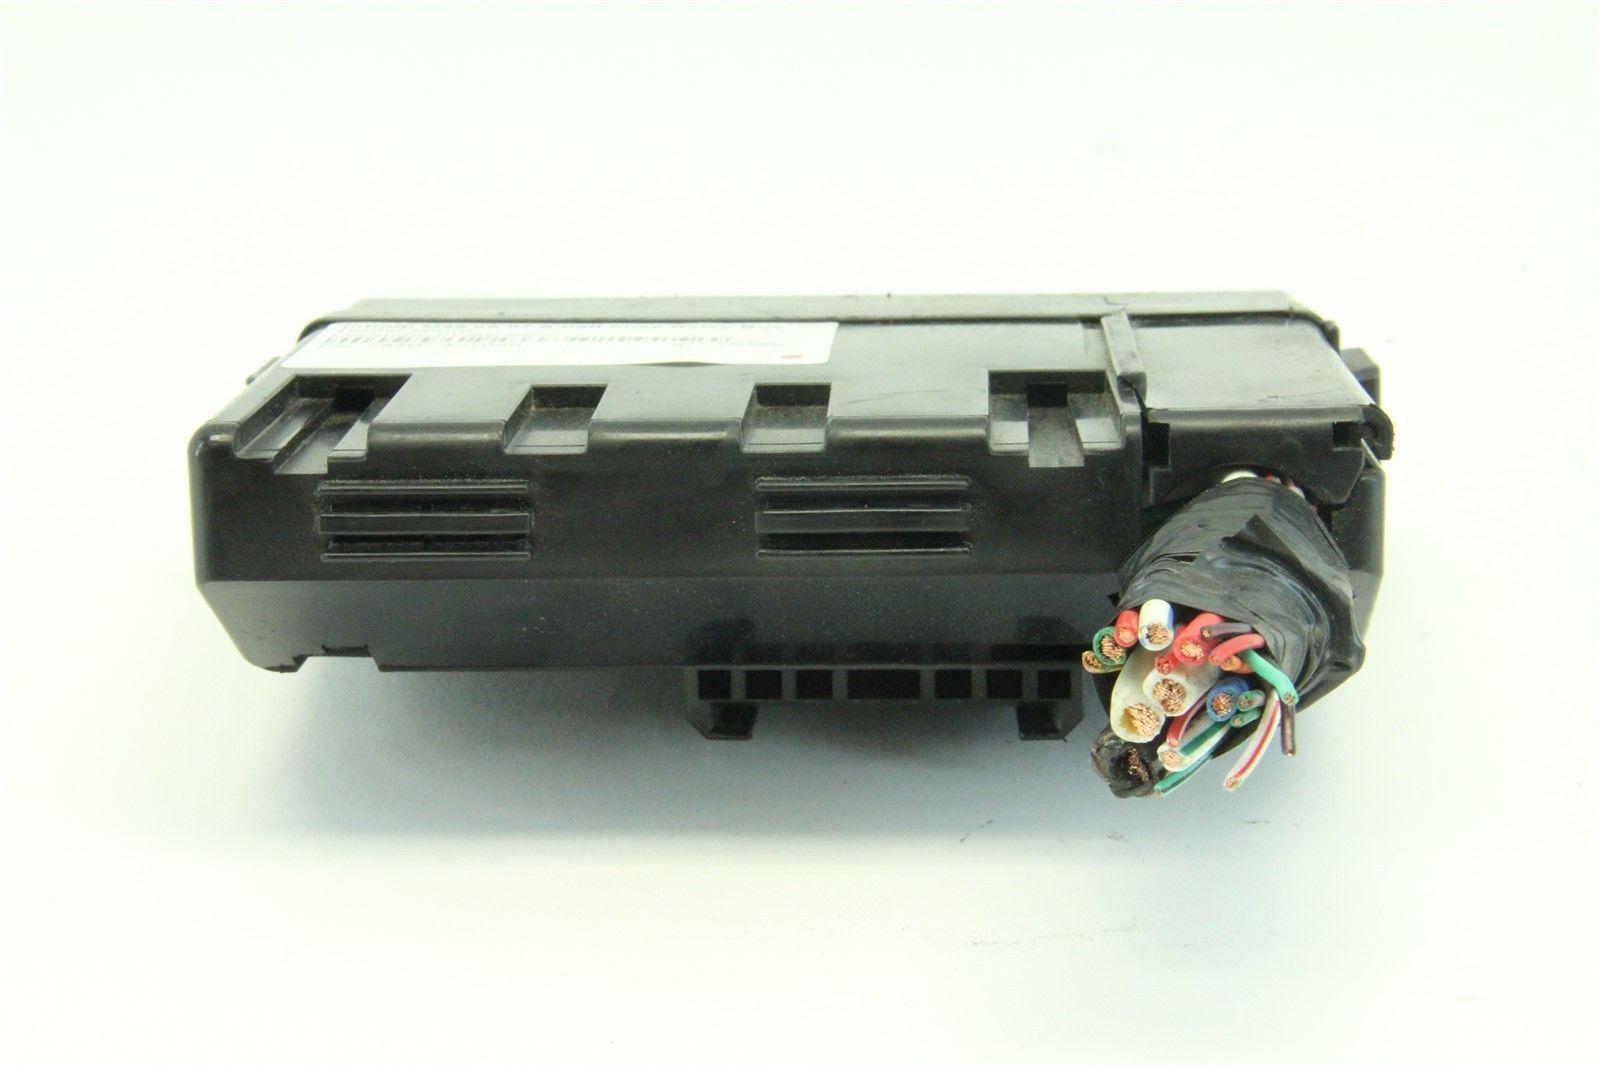 infiniti m35 06-07 small fuse relay box under hood 284b7 ... 2006 infiniti m35 fuse box diagram 06 infiniti m35 fuse box #7